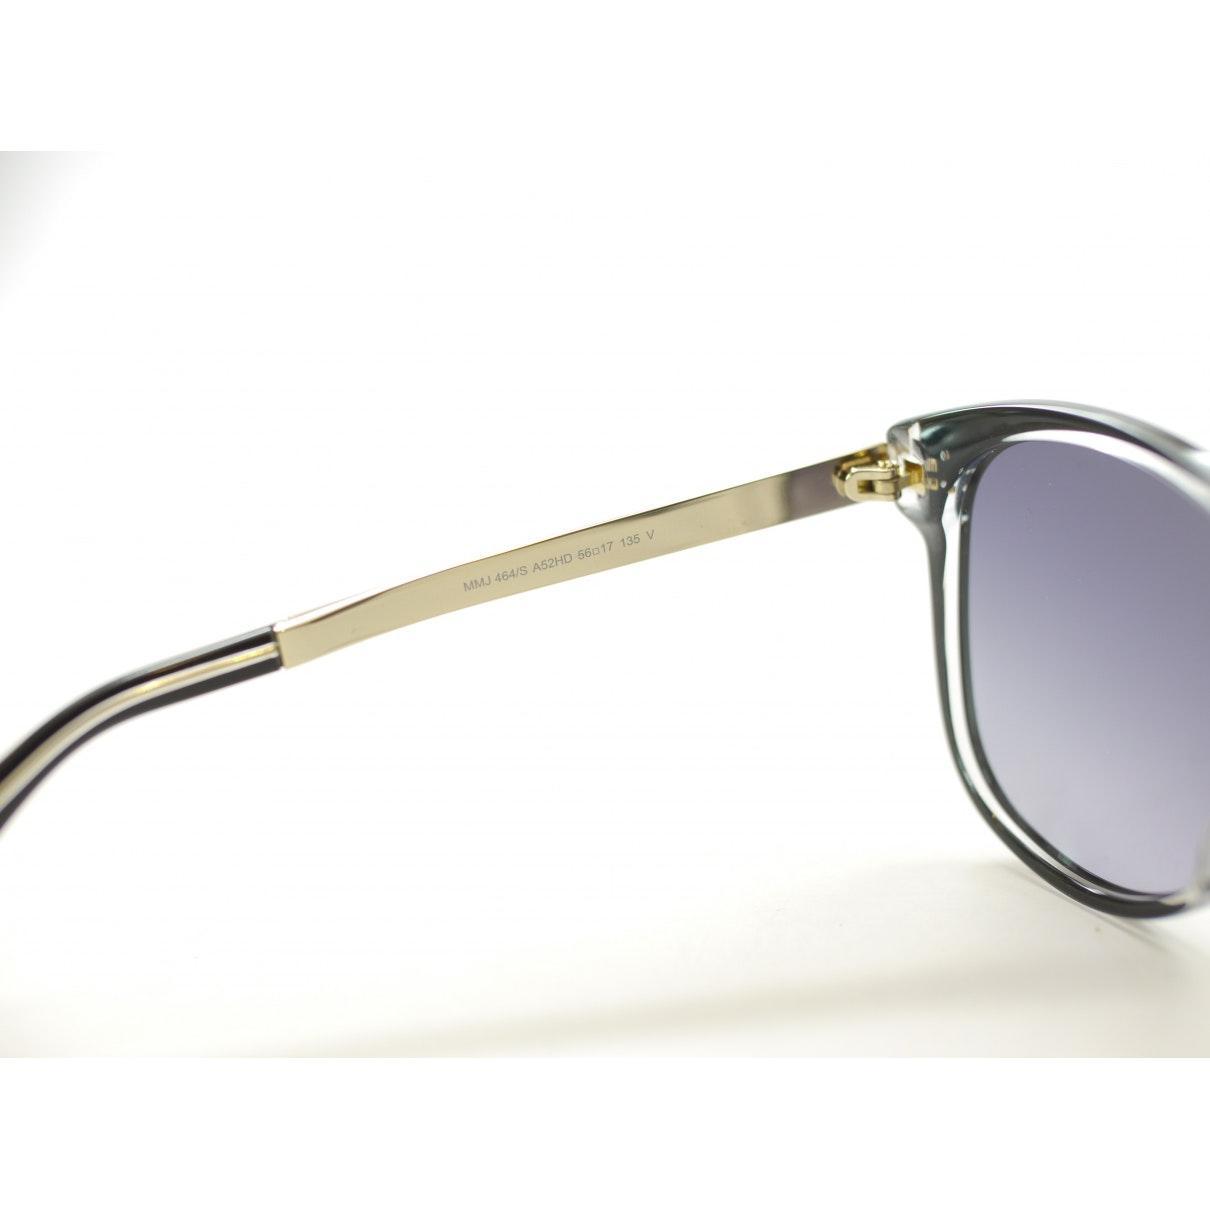 Marc By Marc Jacobs Black Plastic Sunglasses